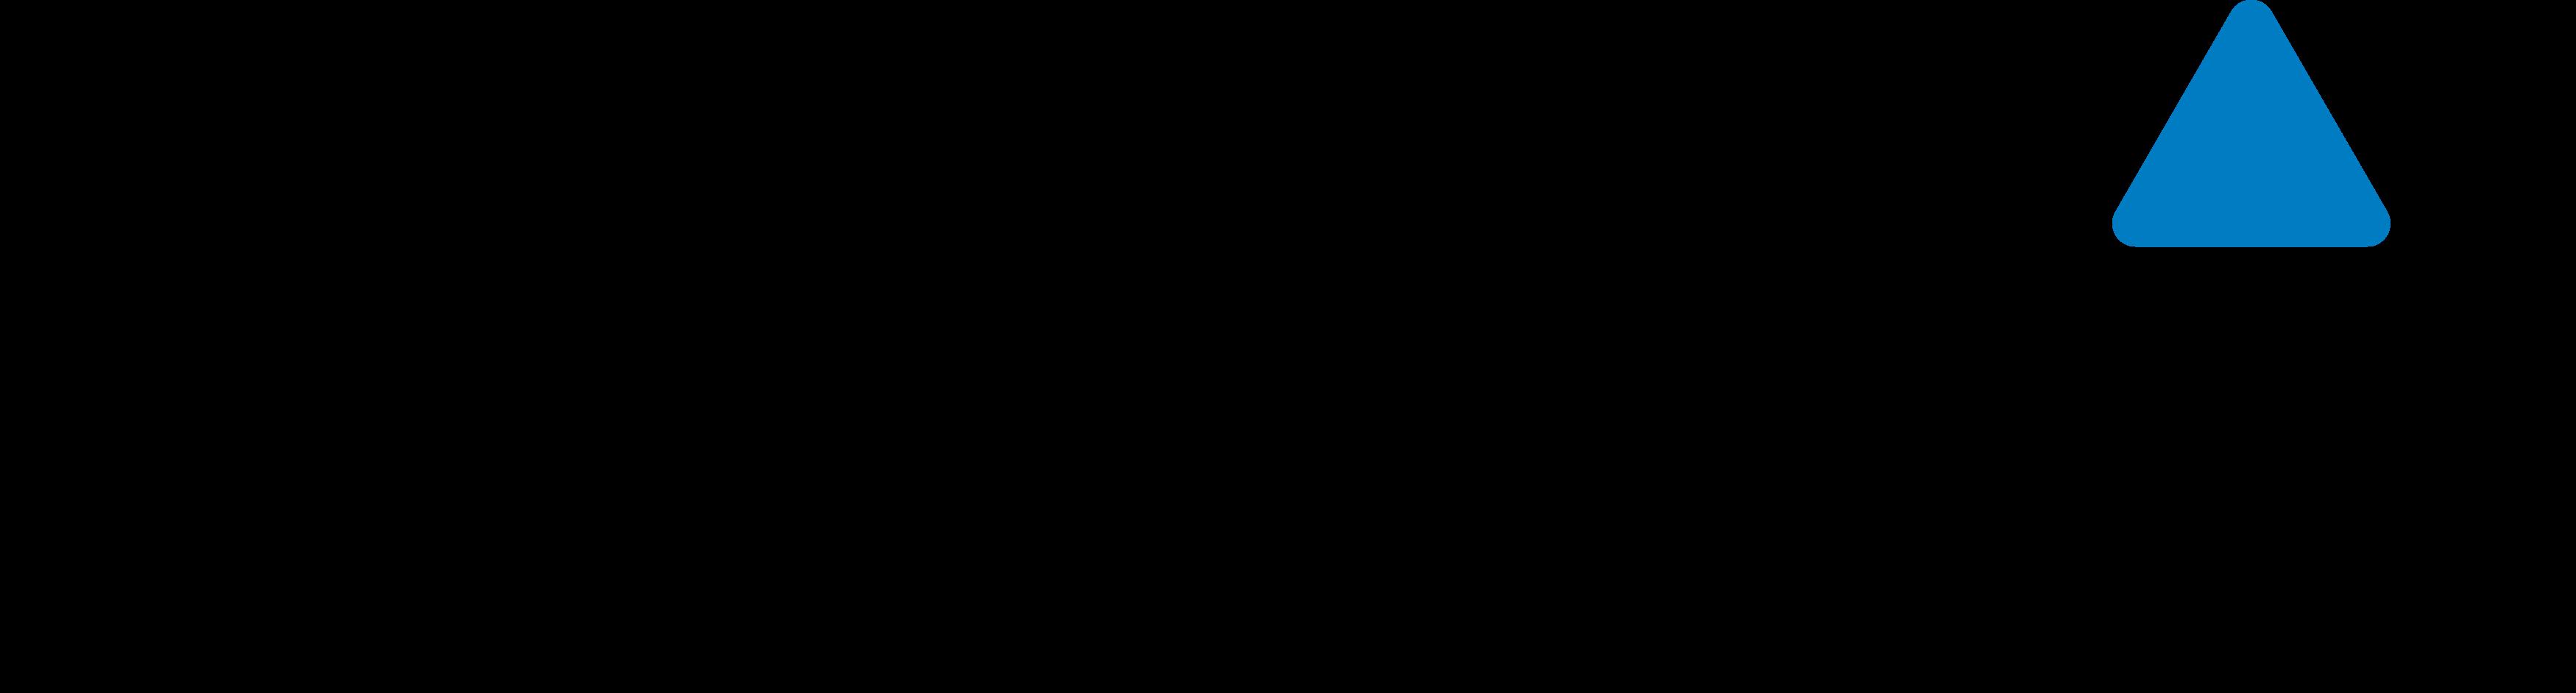 Garmin-logo-1